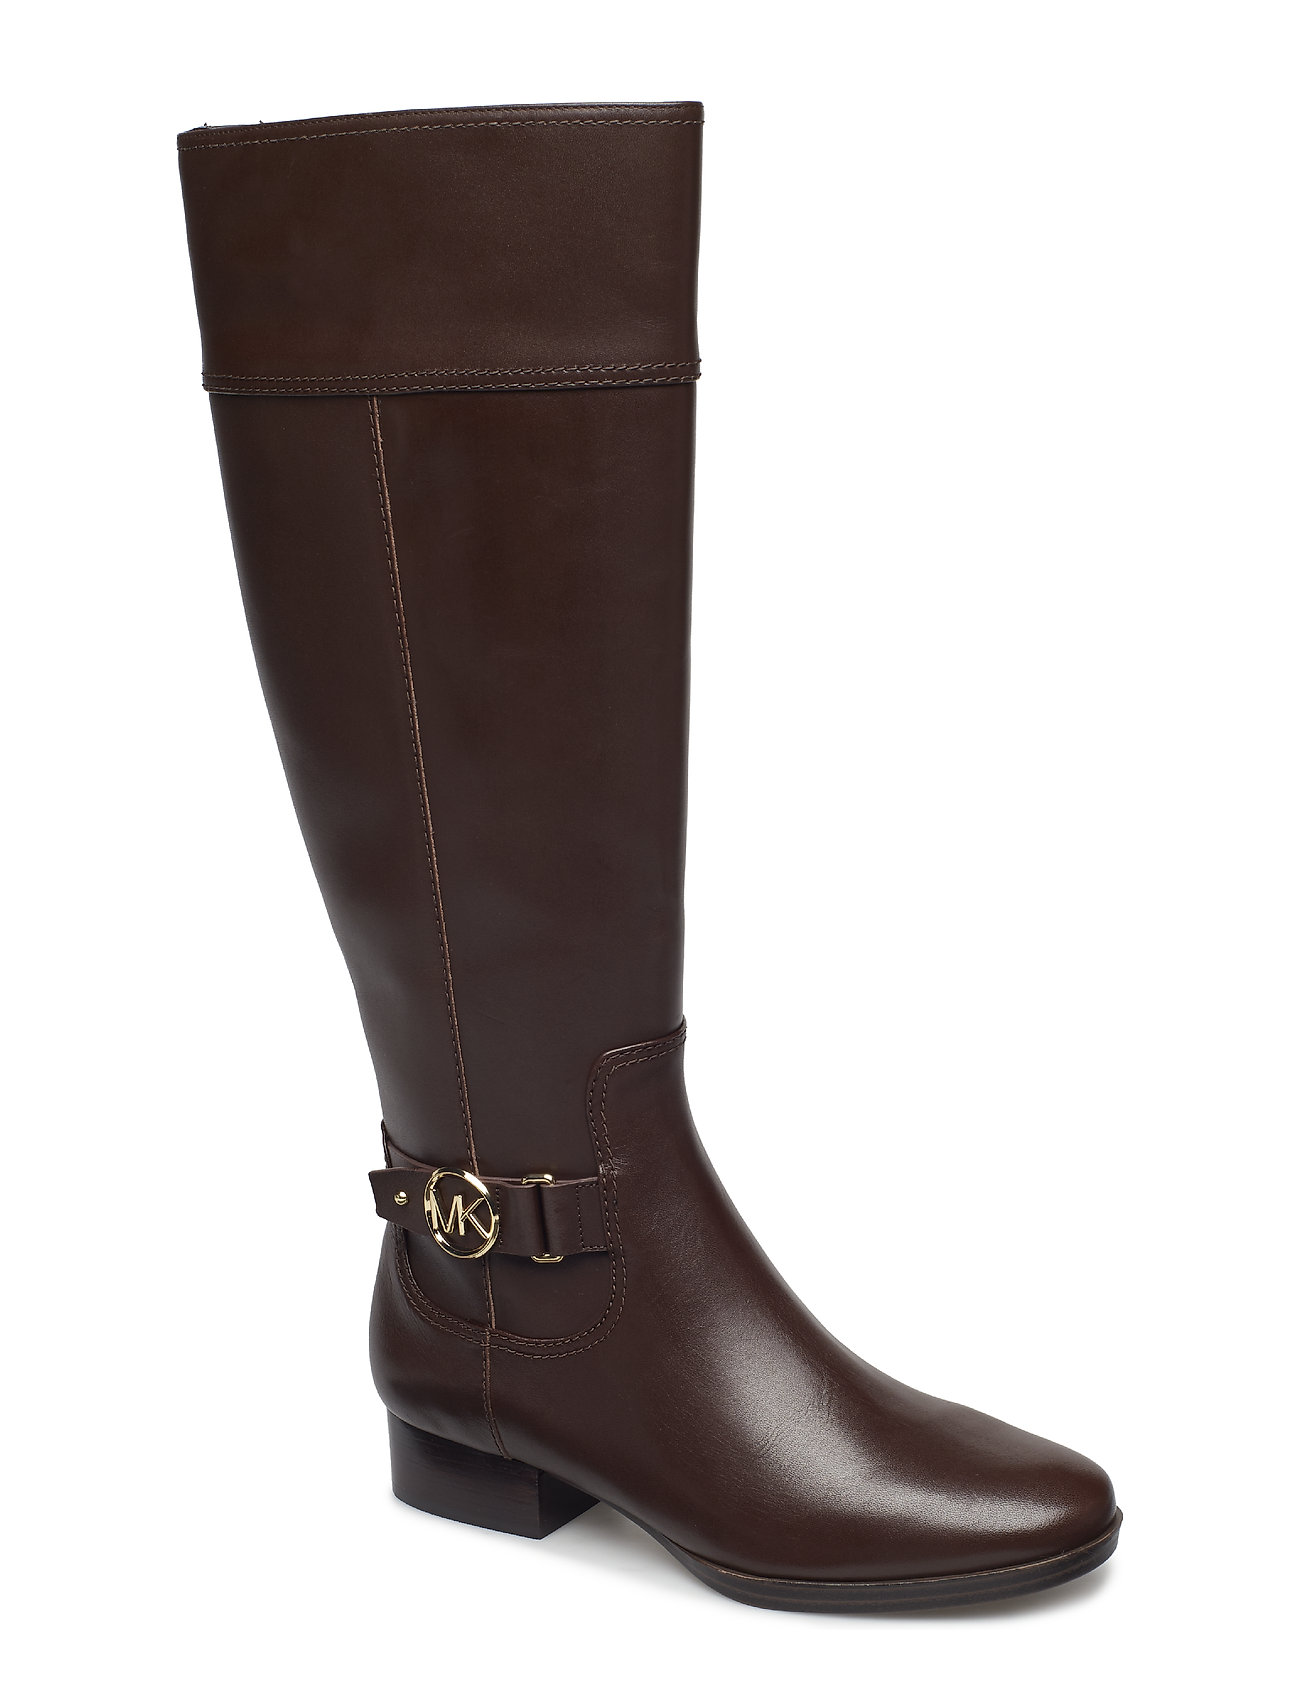 e4fc60c5f742 Harland Boot (Nutmeg) (£159) - Michael Kors Shoes -